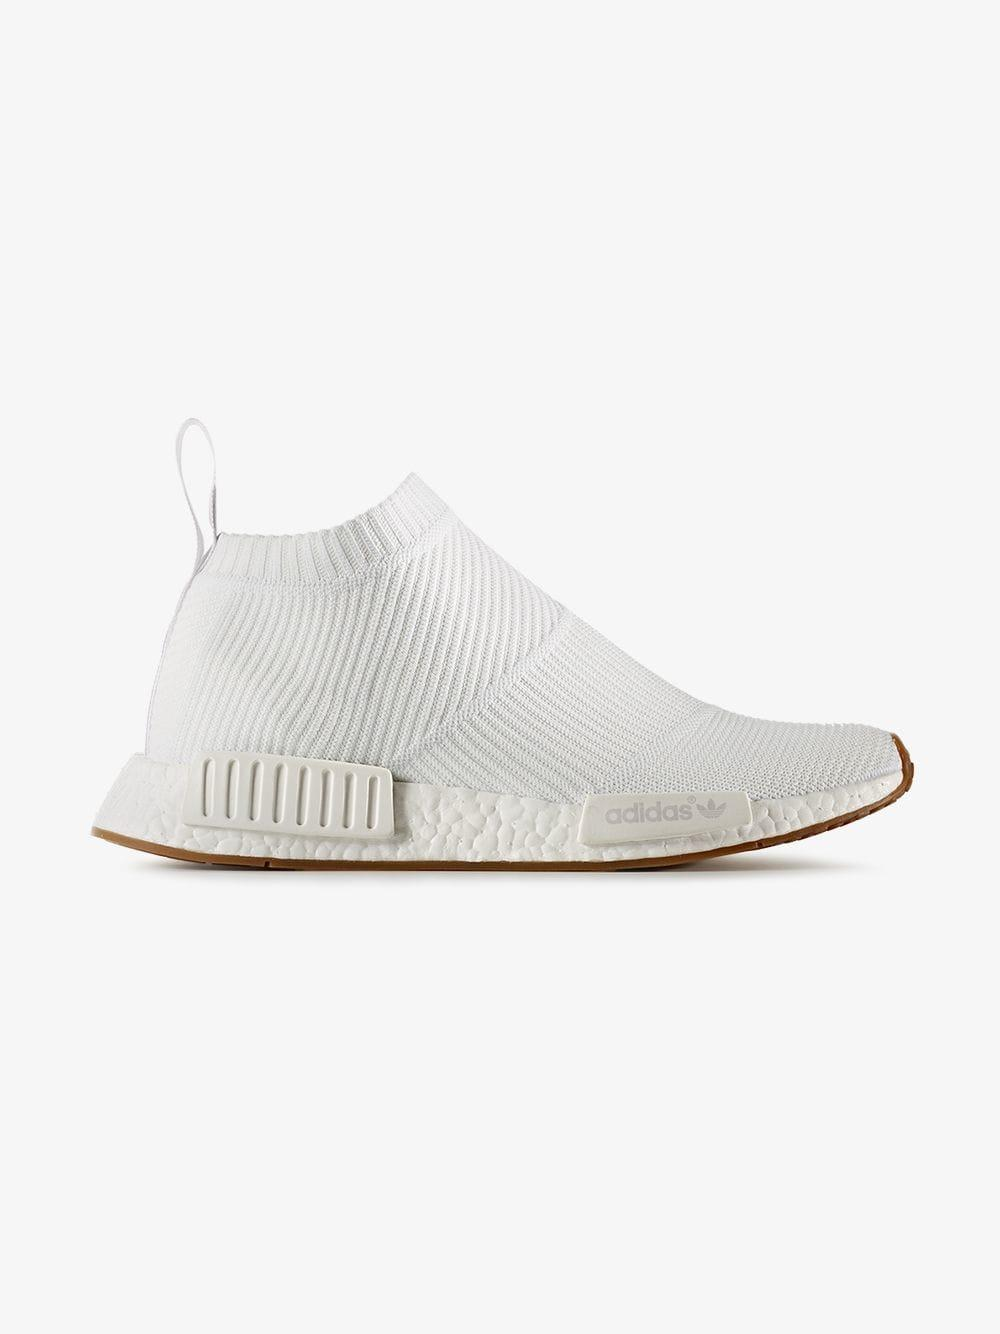 4cf55e756bf77 adidas Originals Nmd cs1 Gtx Pk Sneakers in White for Men - Lyst